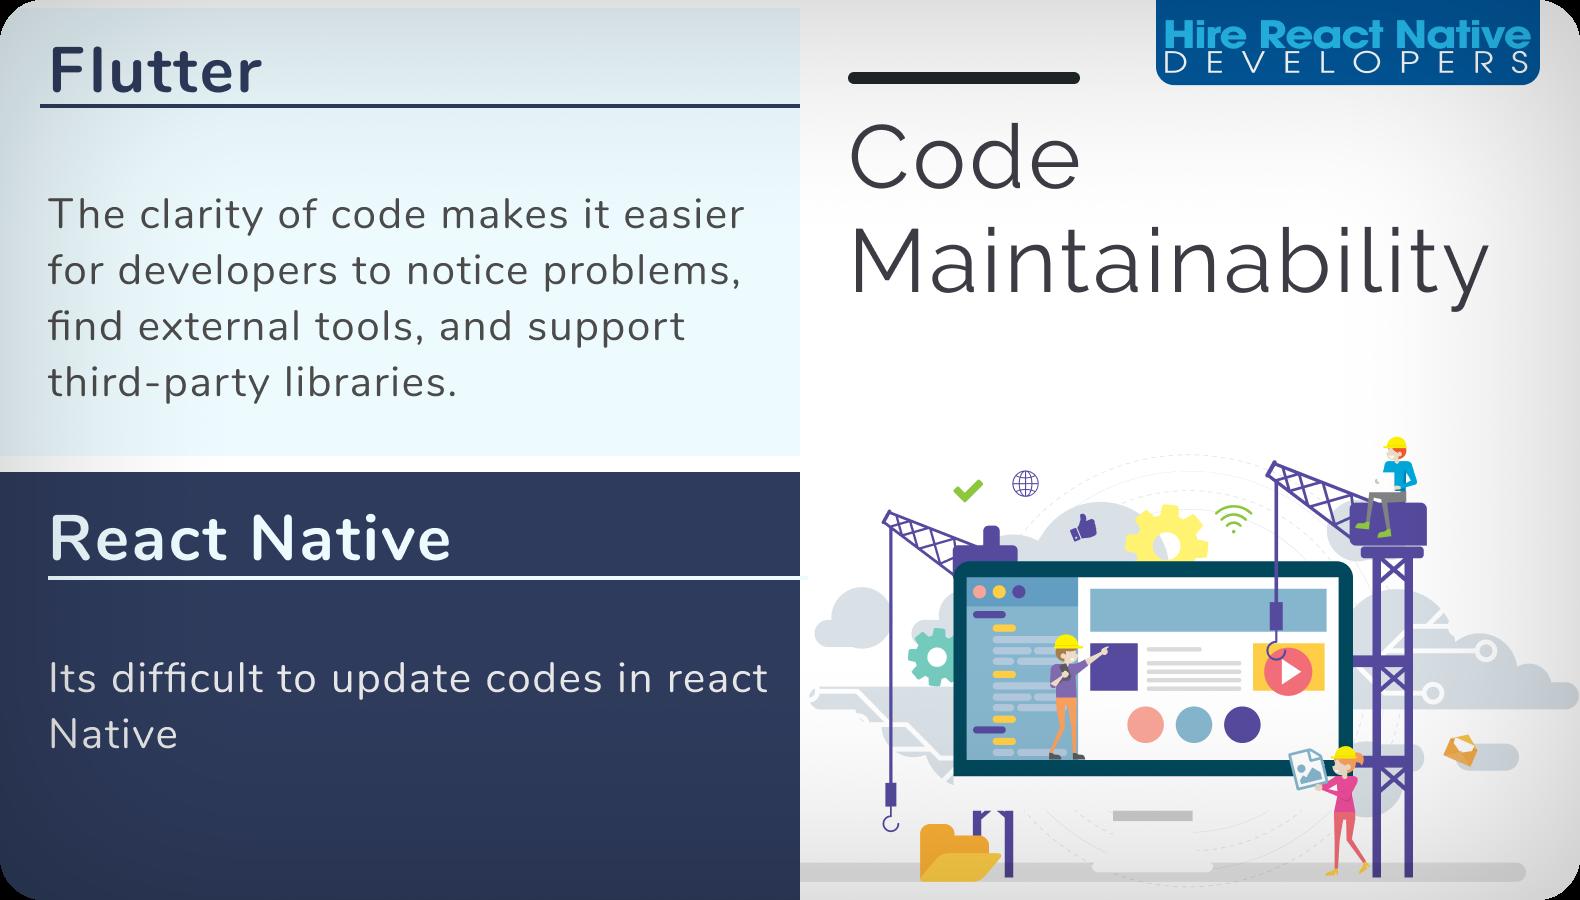 Code Maintainability – React Native vs Flutter